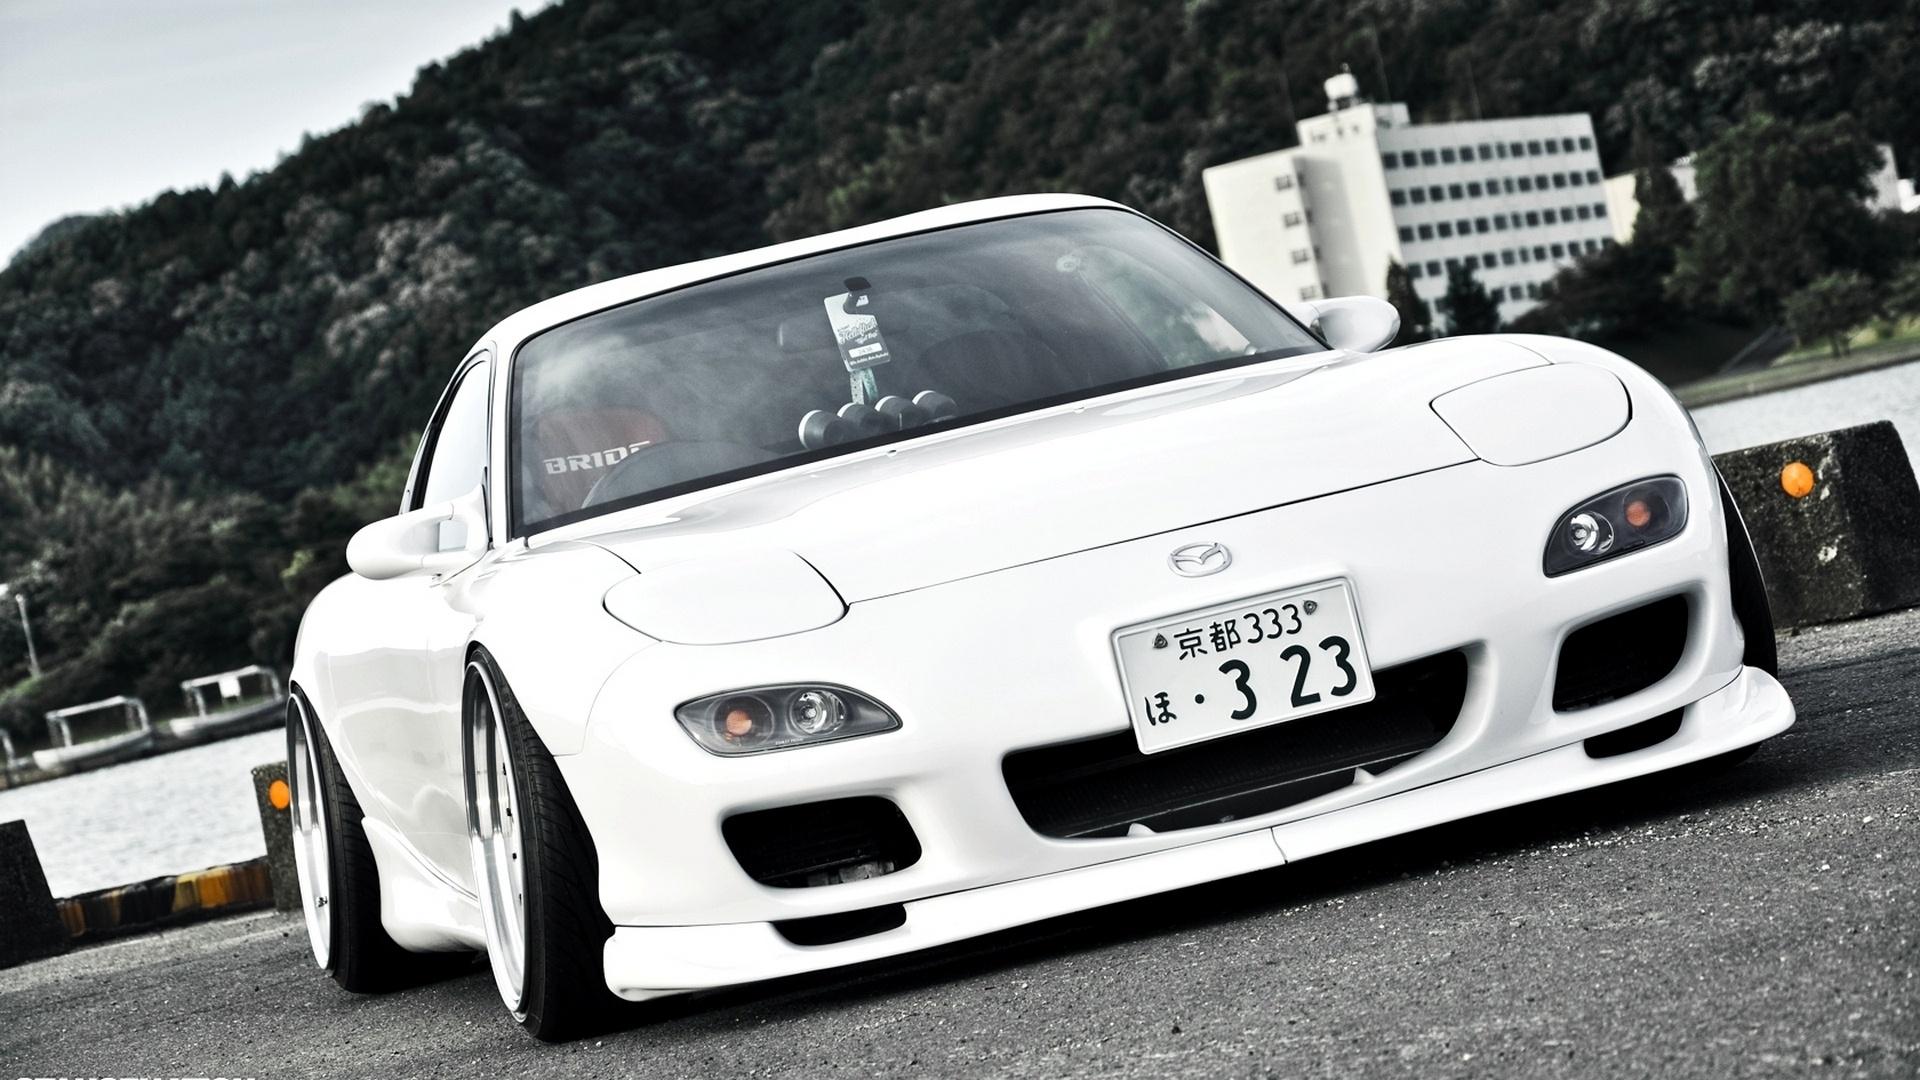 Wallpaper Mazda Rx7 White Car Japan 1920x1080 Full Hd 2k